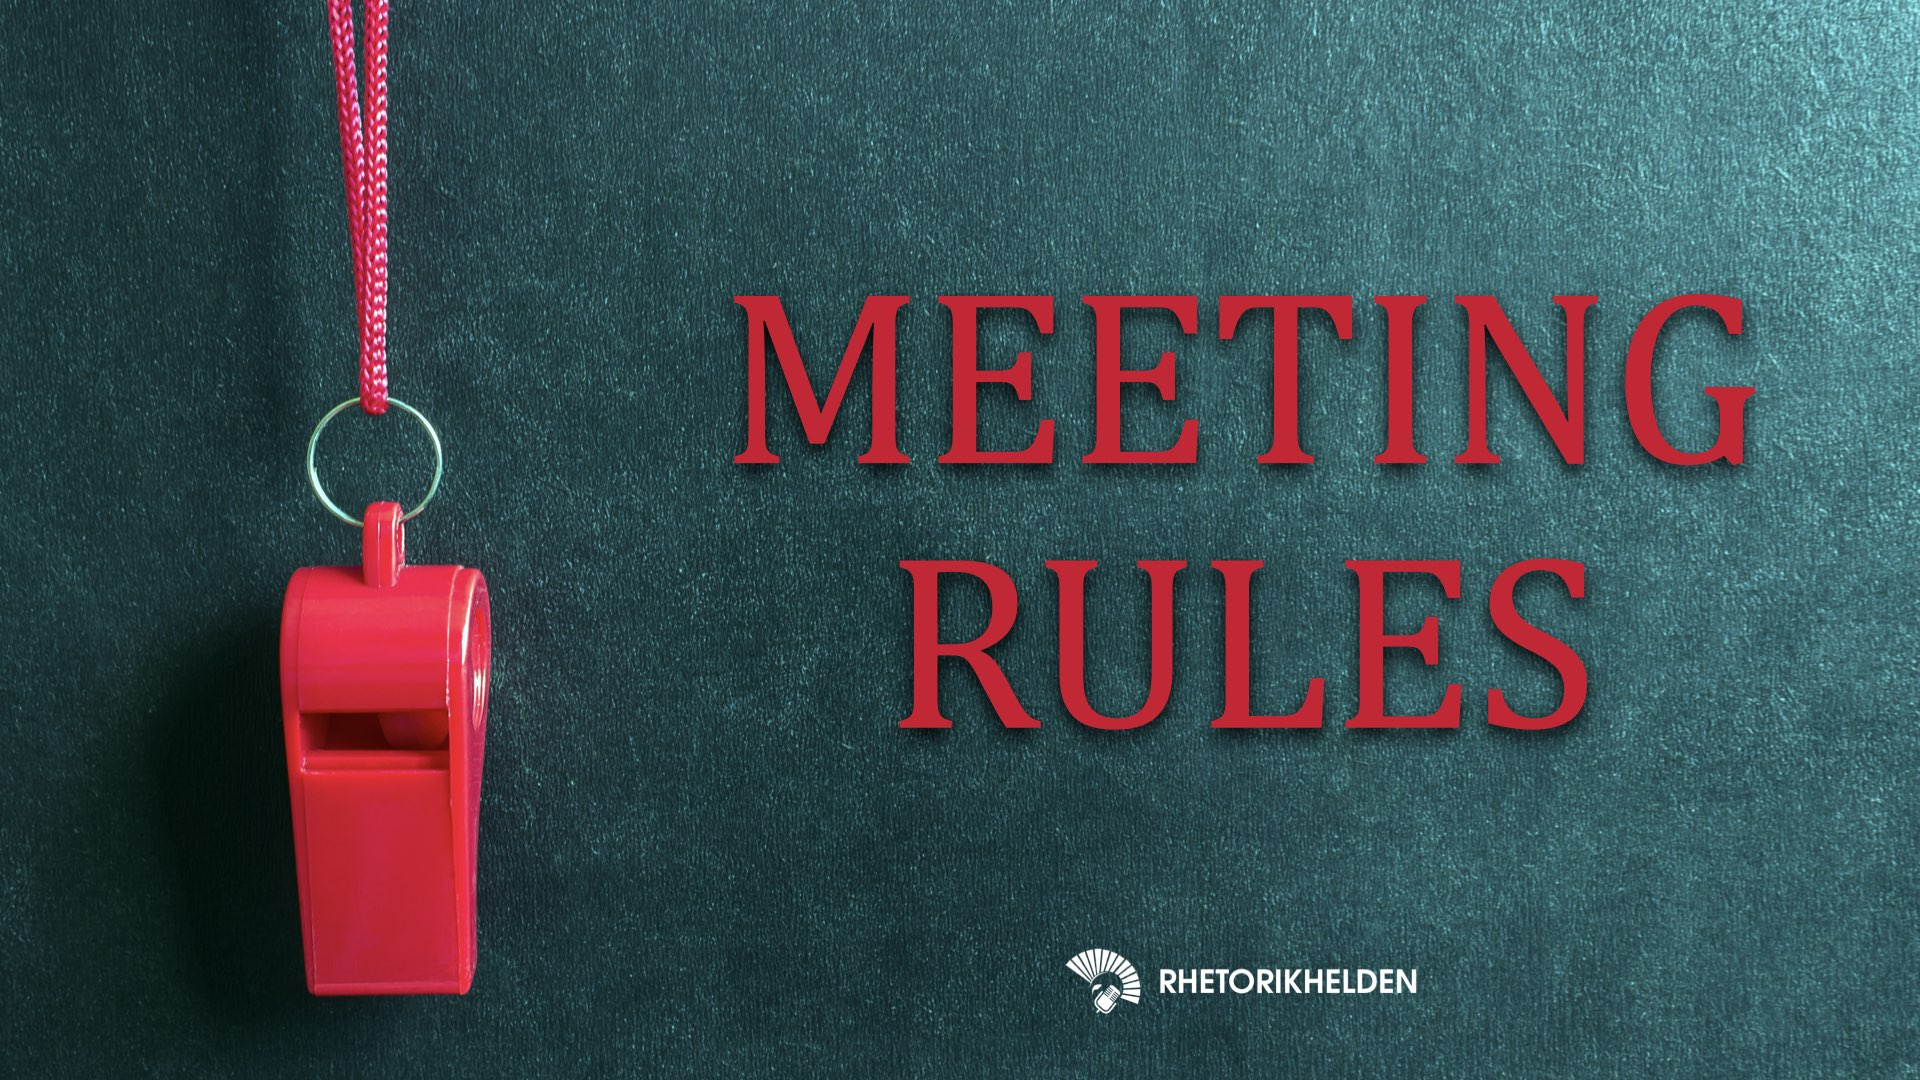 meeting-rules-moderation-rhetorikhelden-